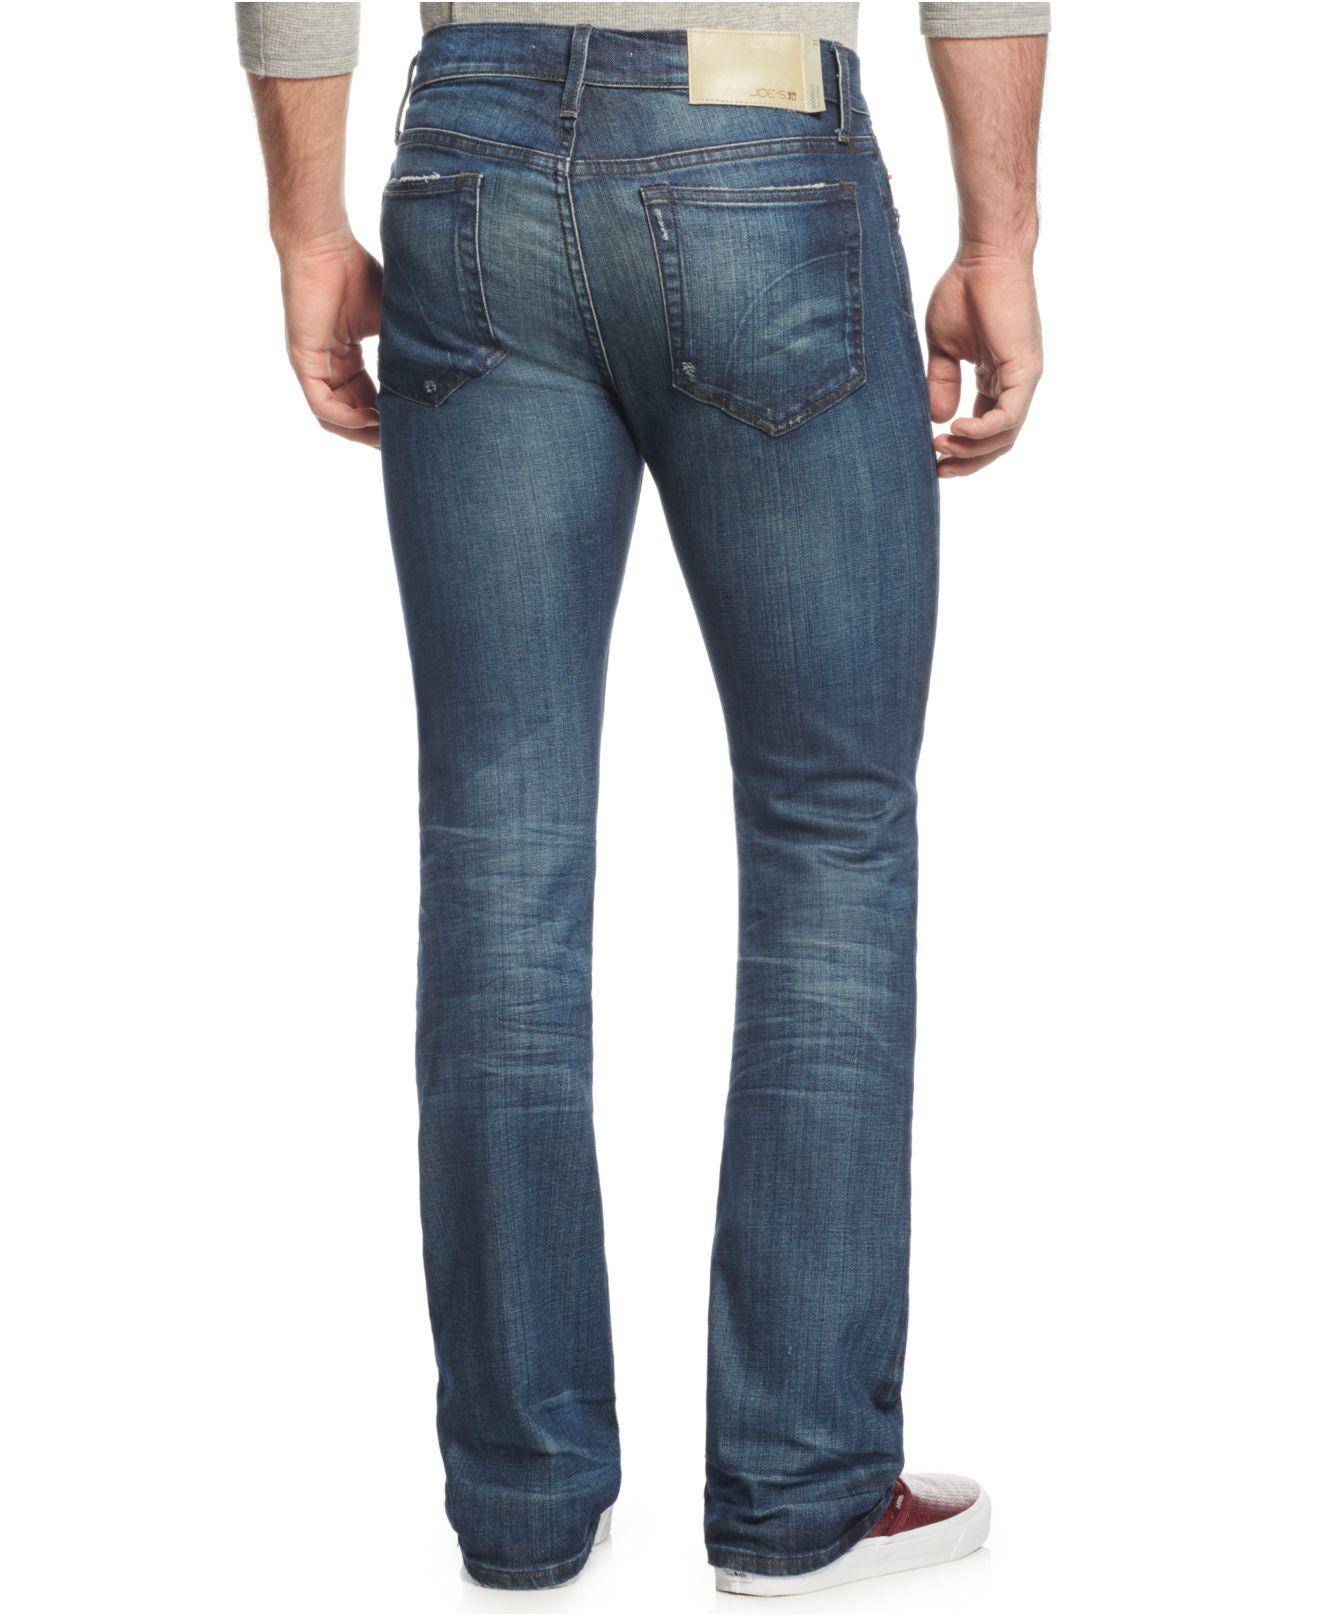 joe 39 s jeans the rocker bootcut jeans in blue for men lyst. Black Bedroom Furniture Sets. Home Design Ideas